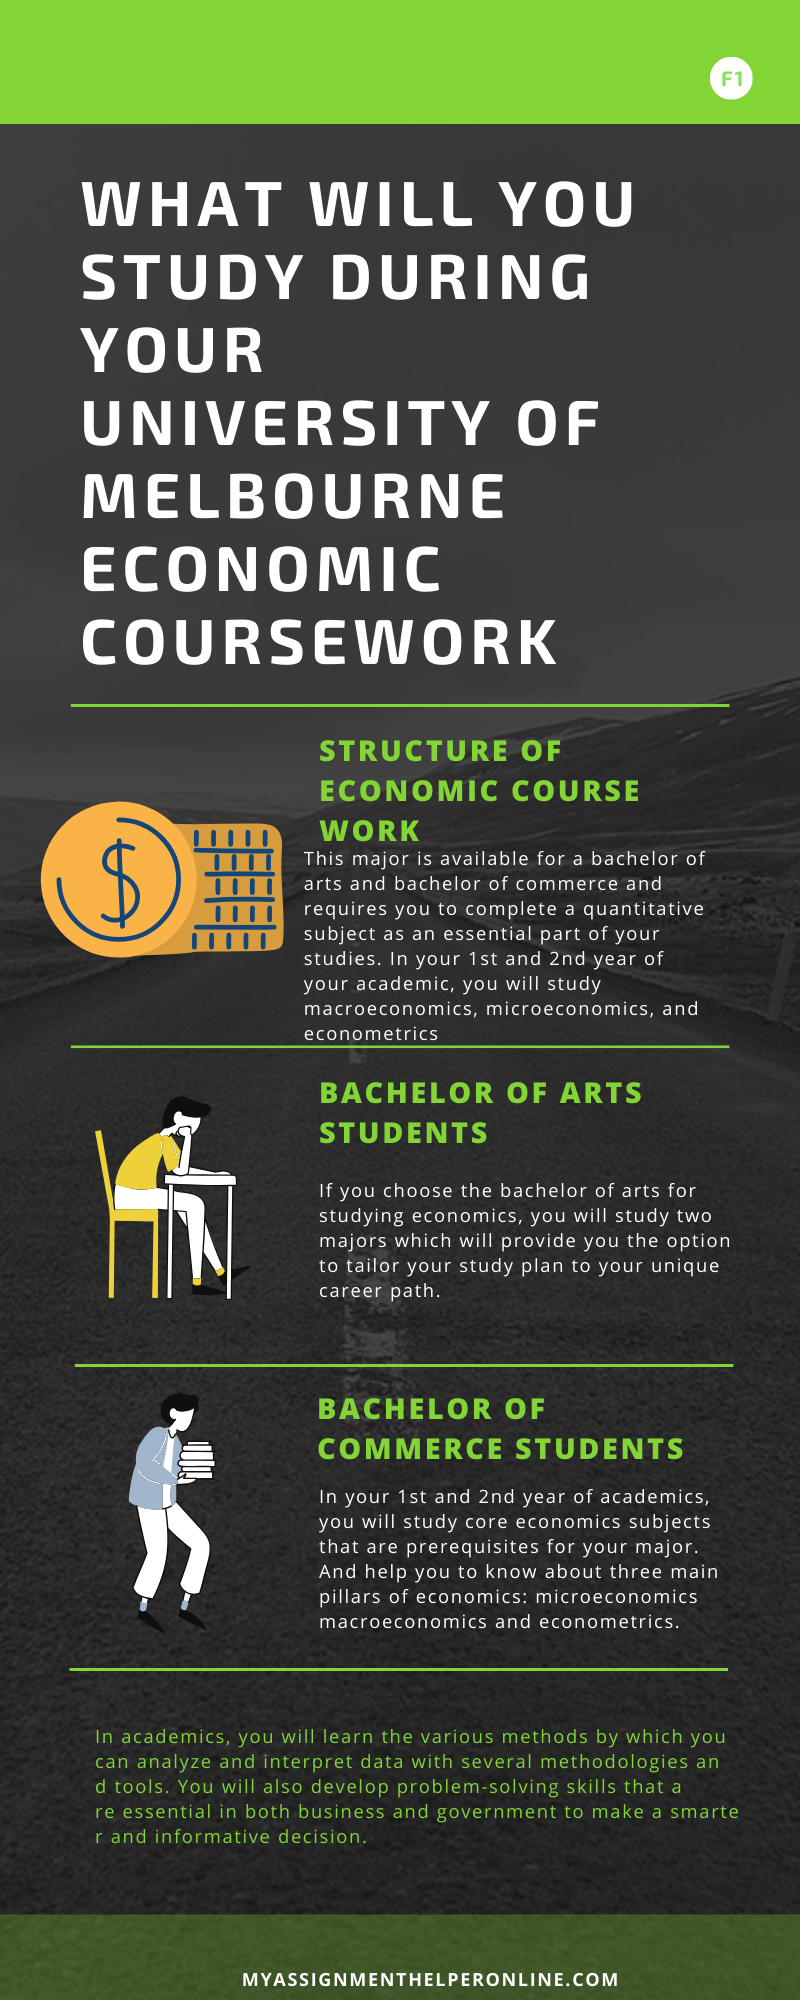 university-of-Melbourne-economic coursework